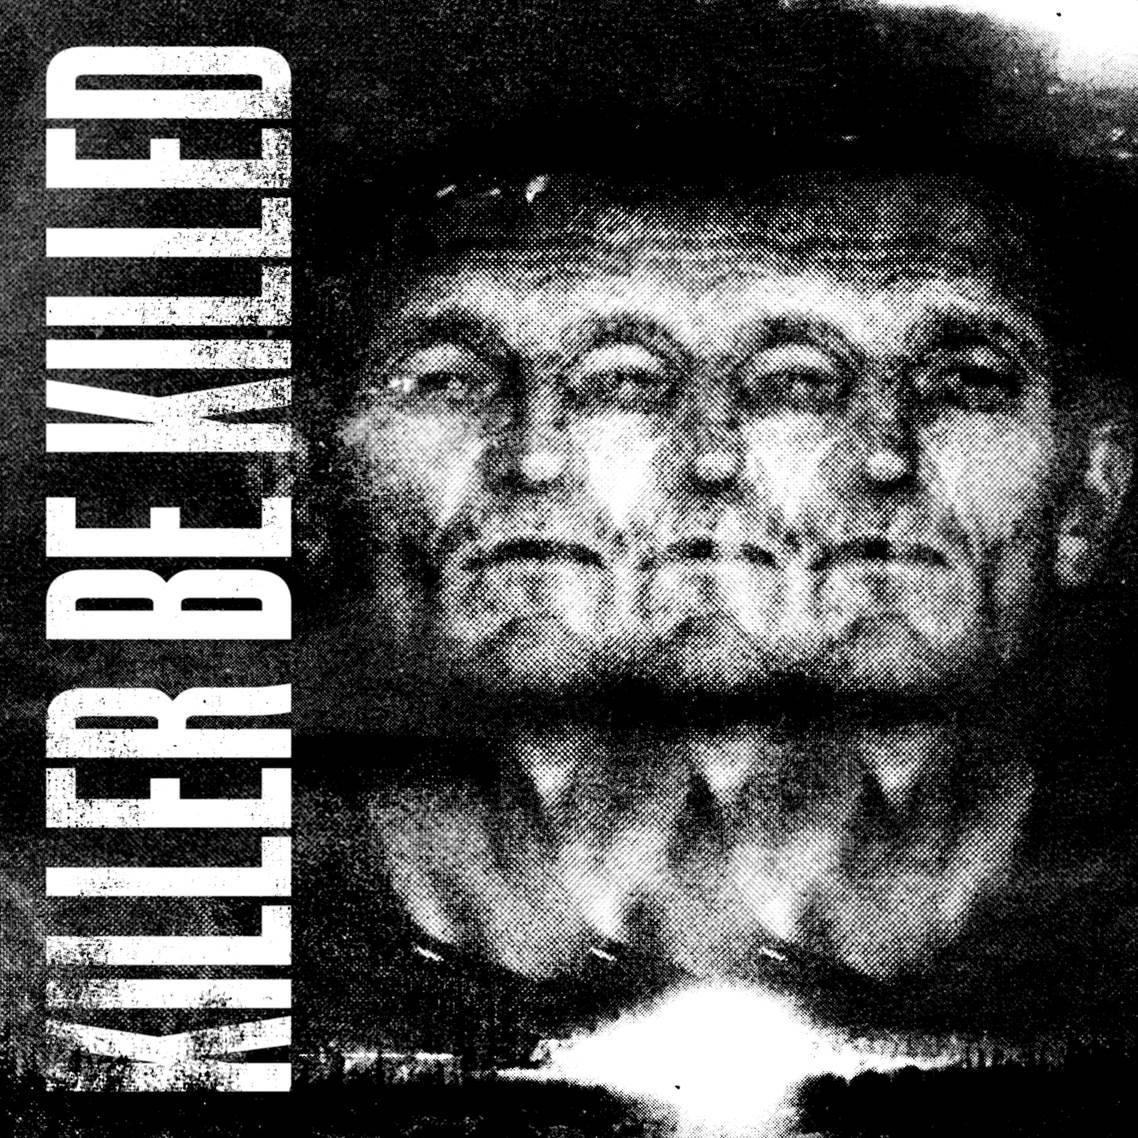 Killer Be Killed - Killer Be Killed